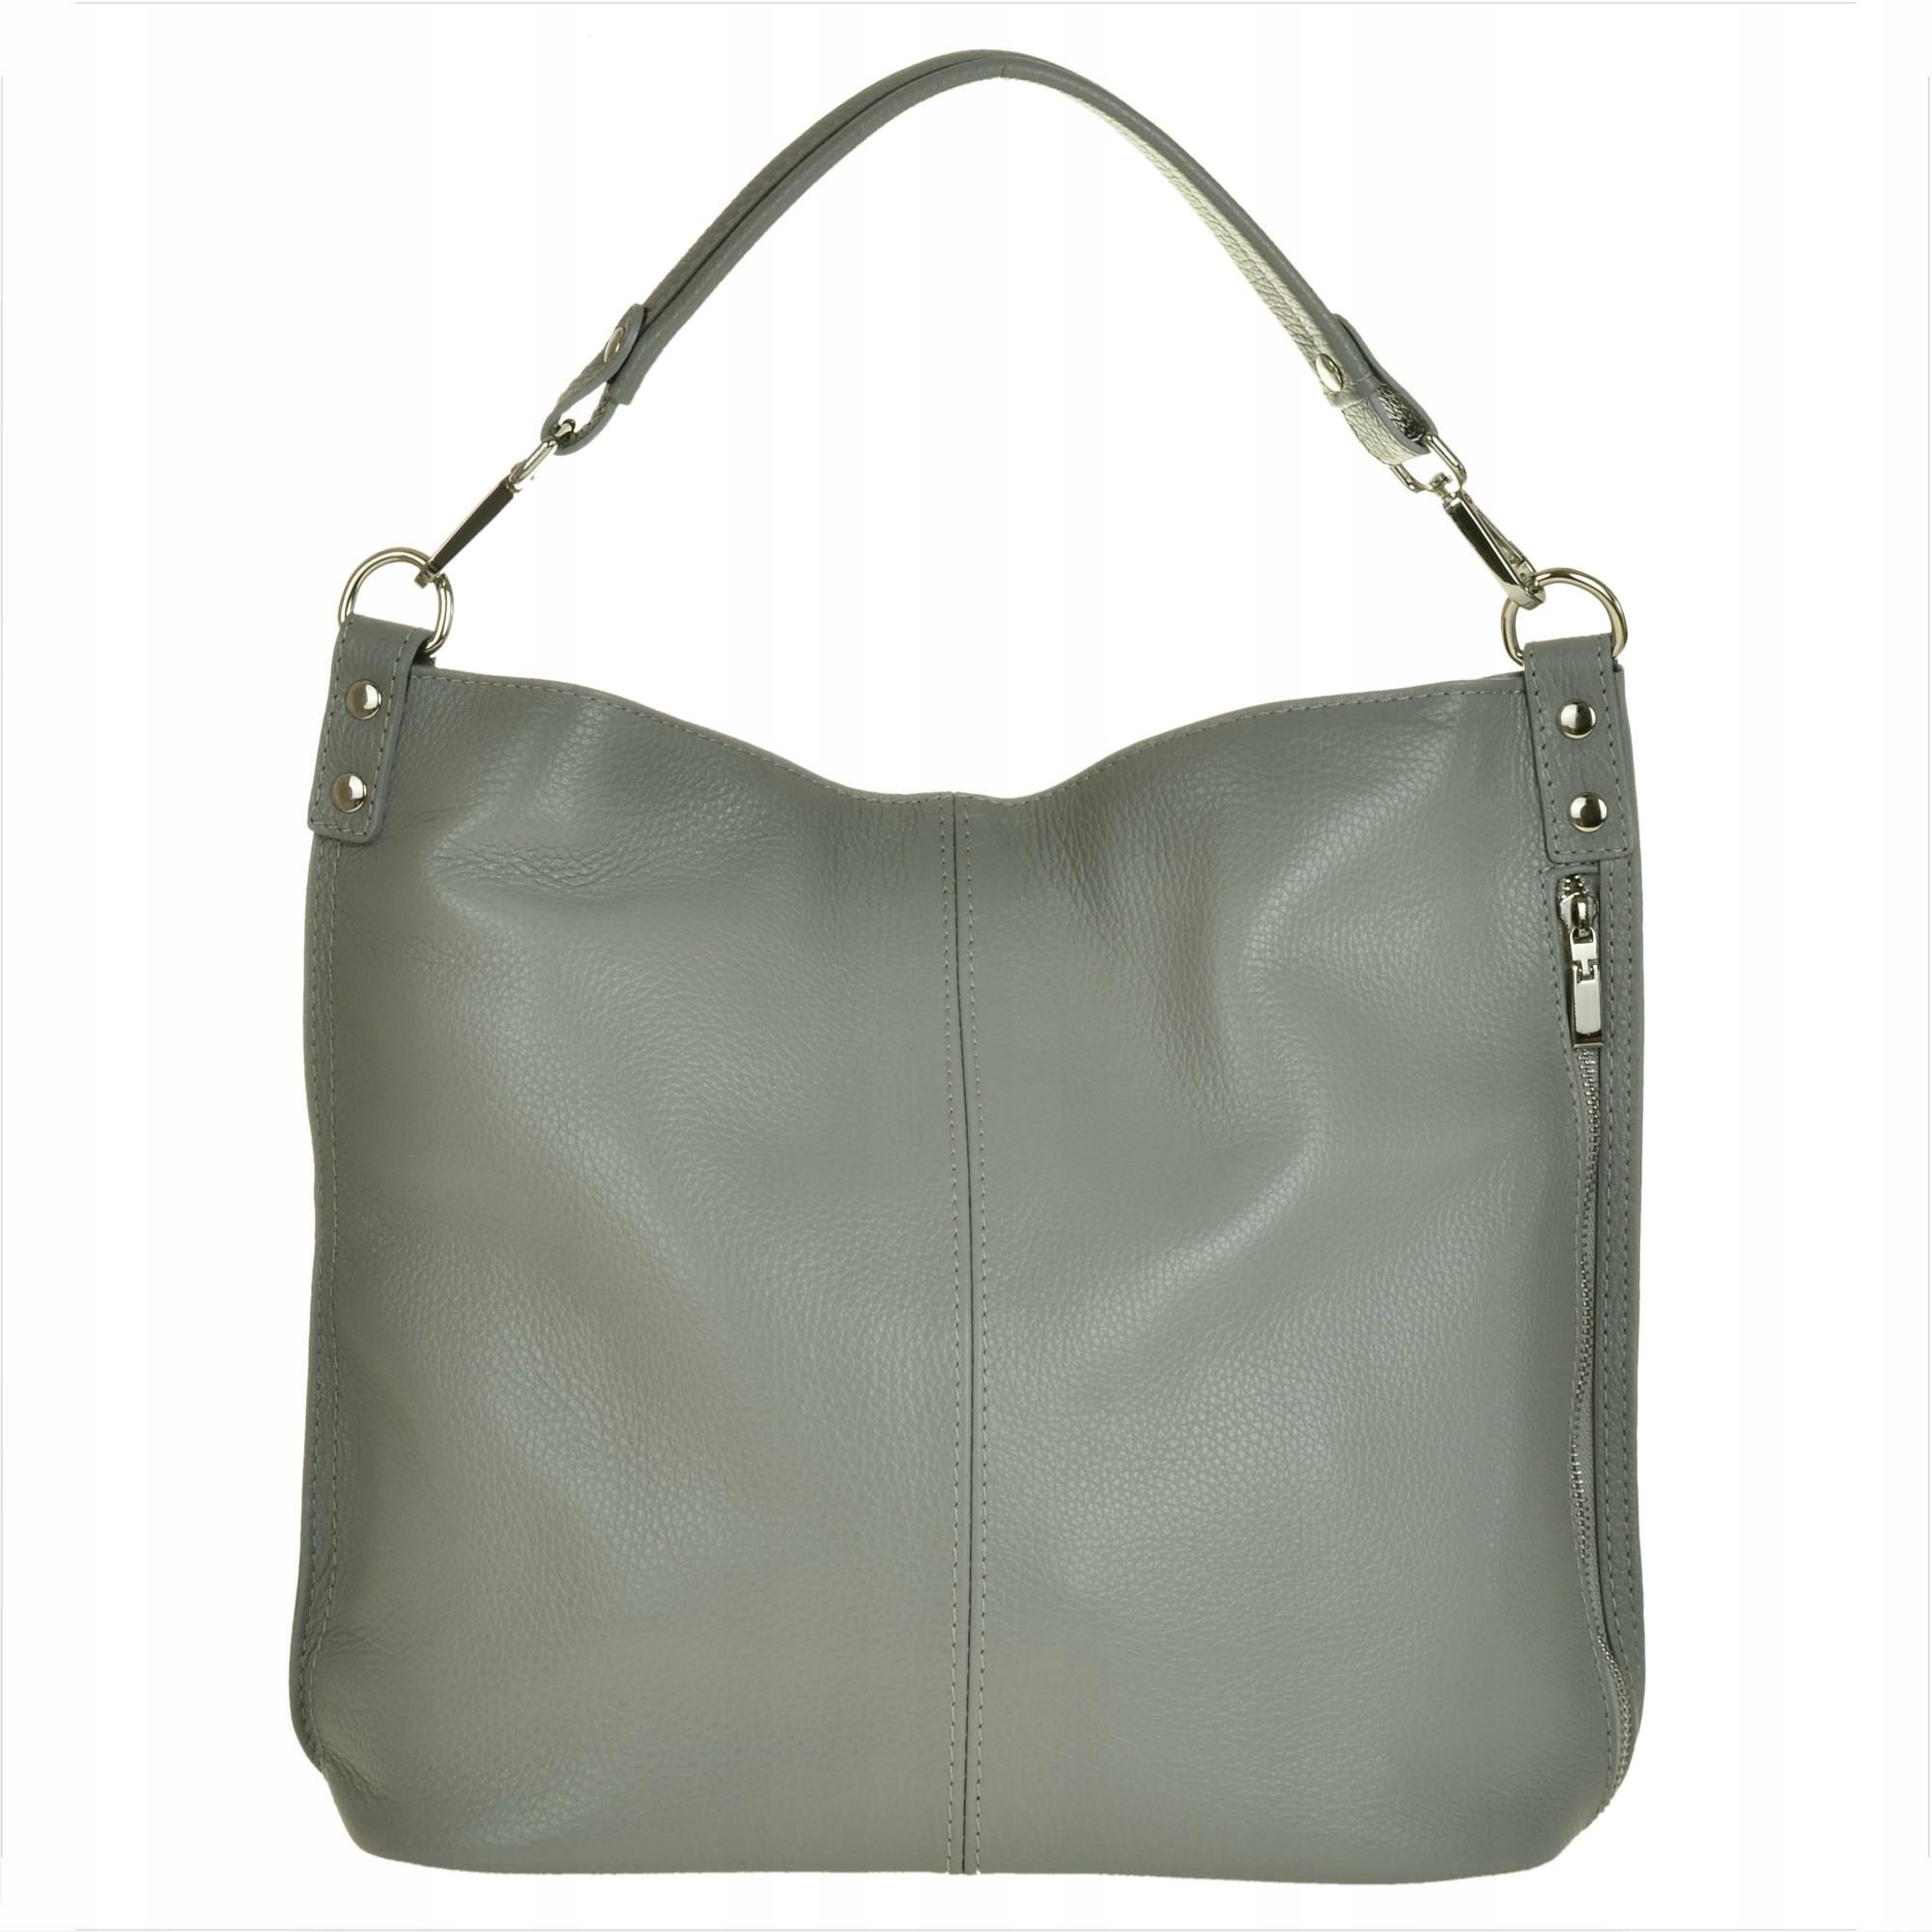 Popielata skórzana torebka typu shopper bag L